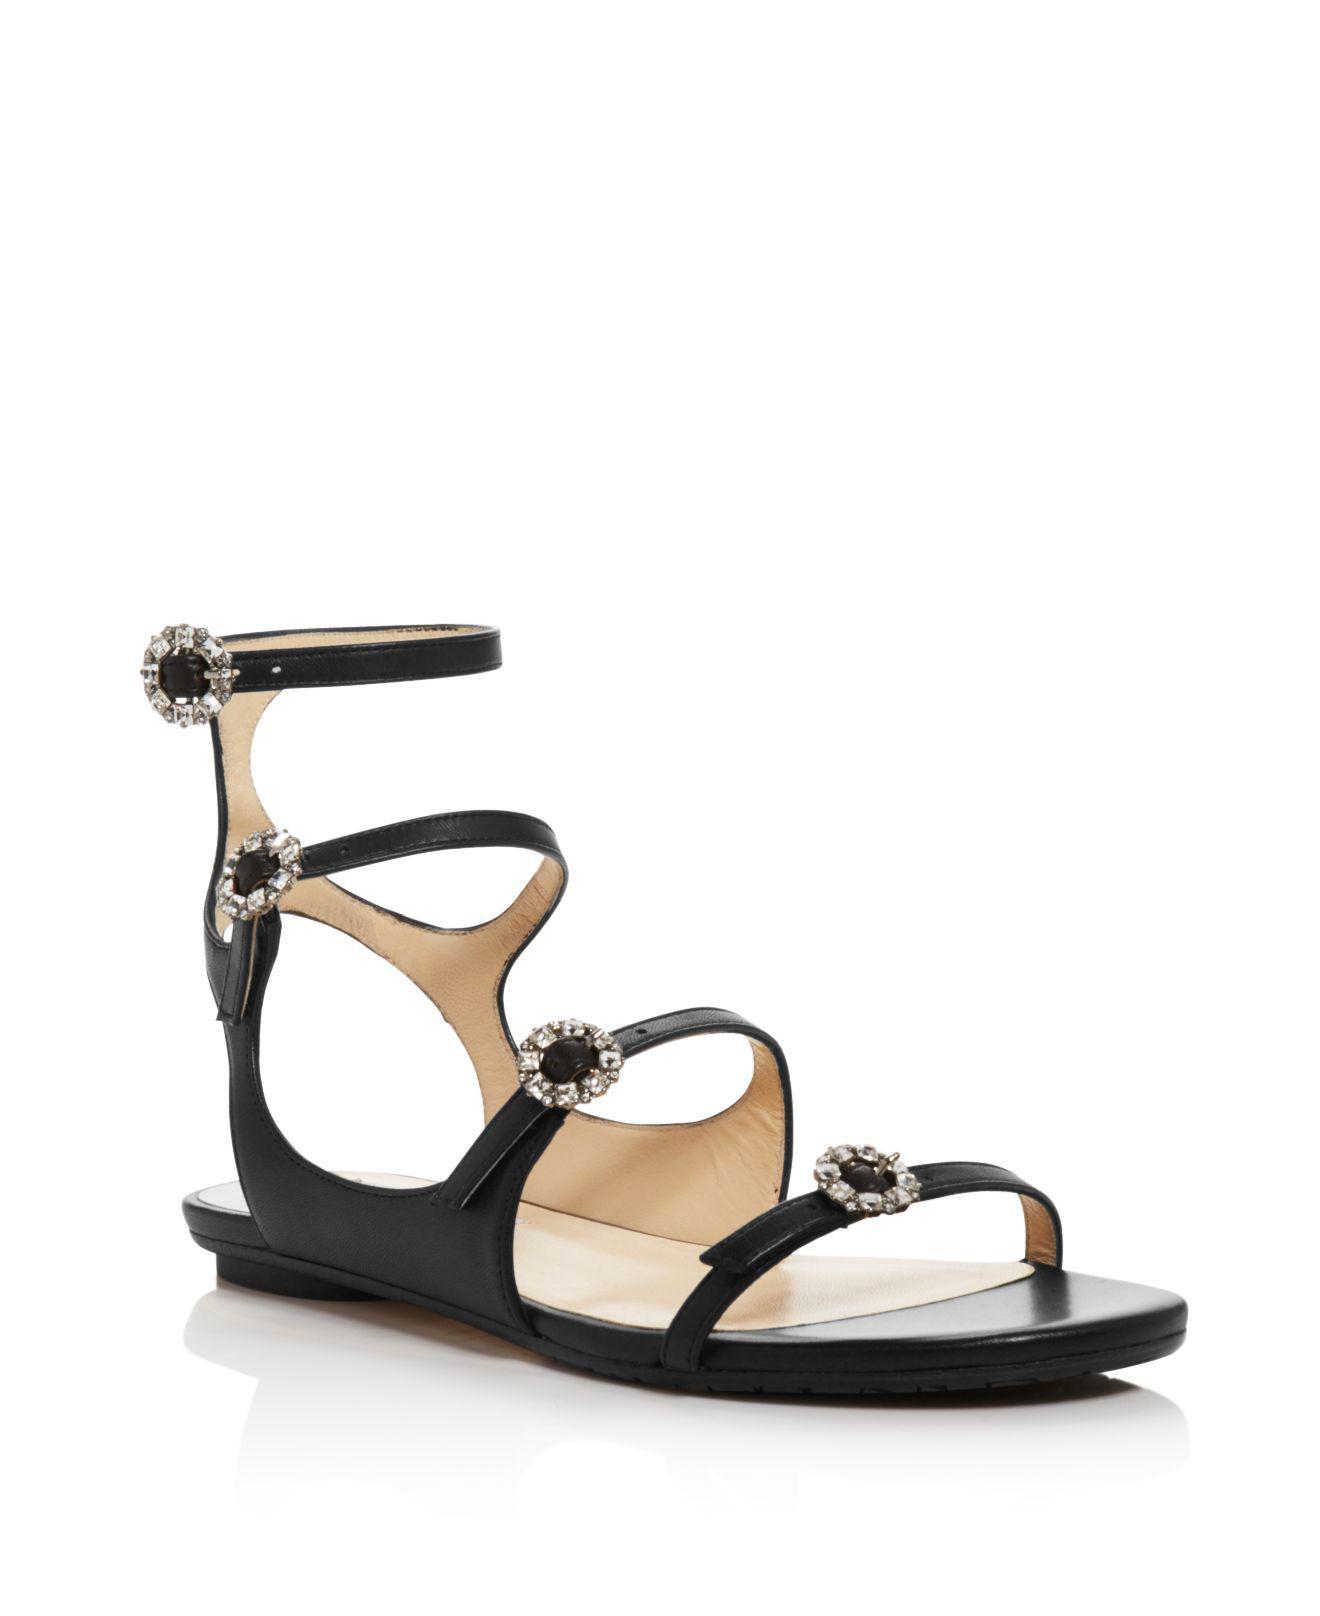 Jimmy choo Women's Naia Embellished Leather Flat Sandals w1MXVrZ0m